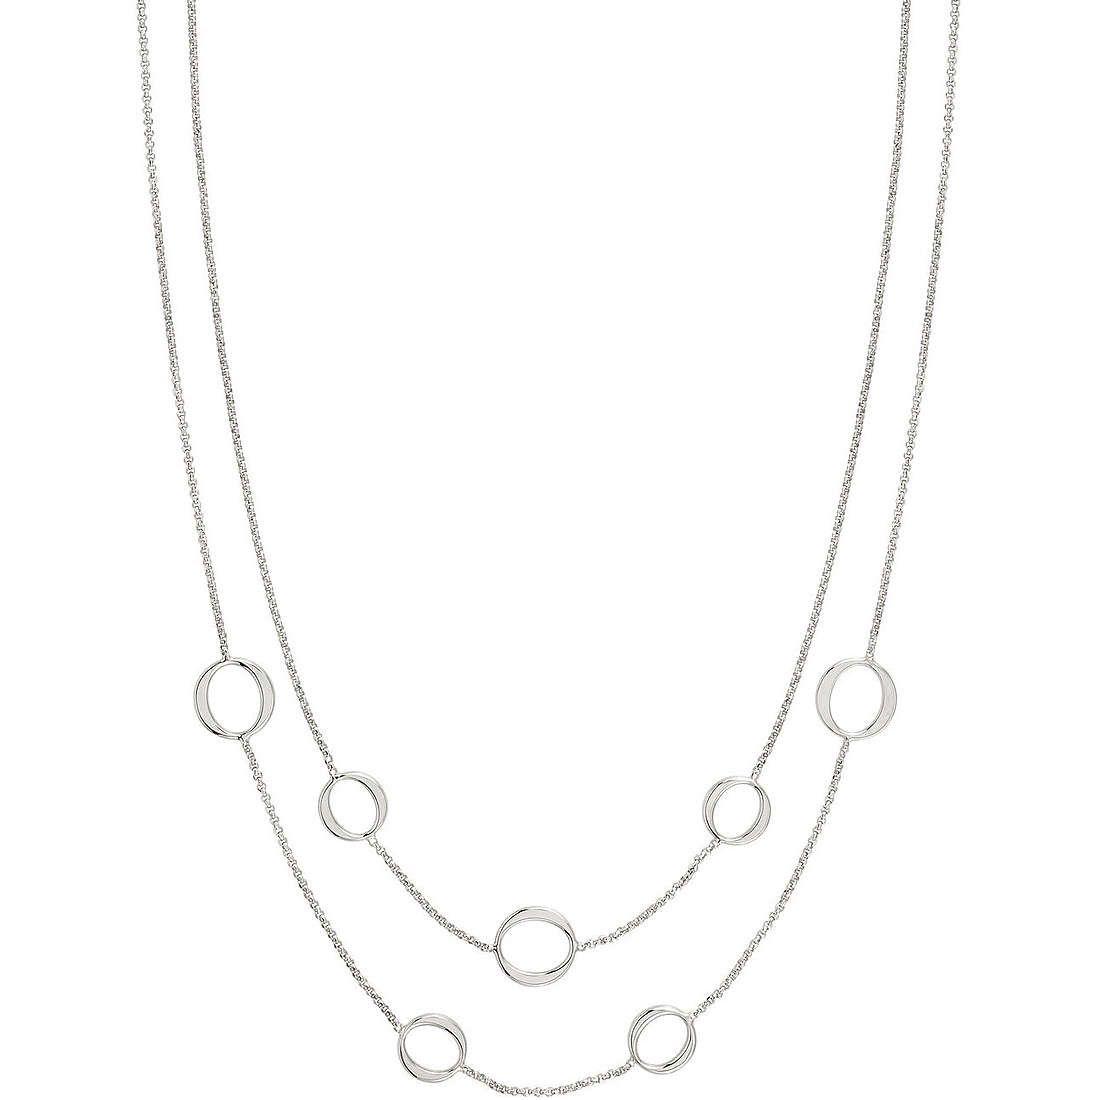 Nomination collana argento ref. 146403/003